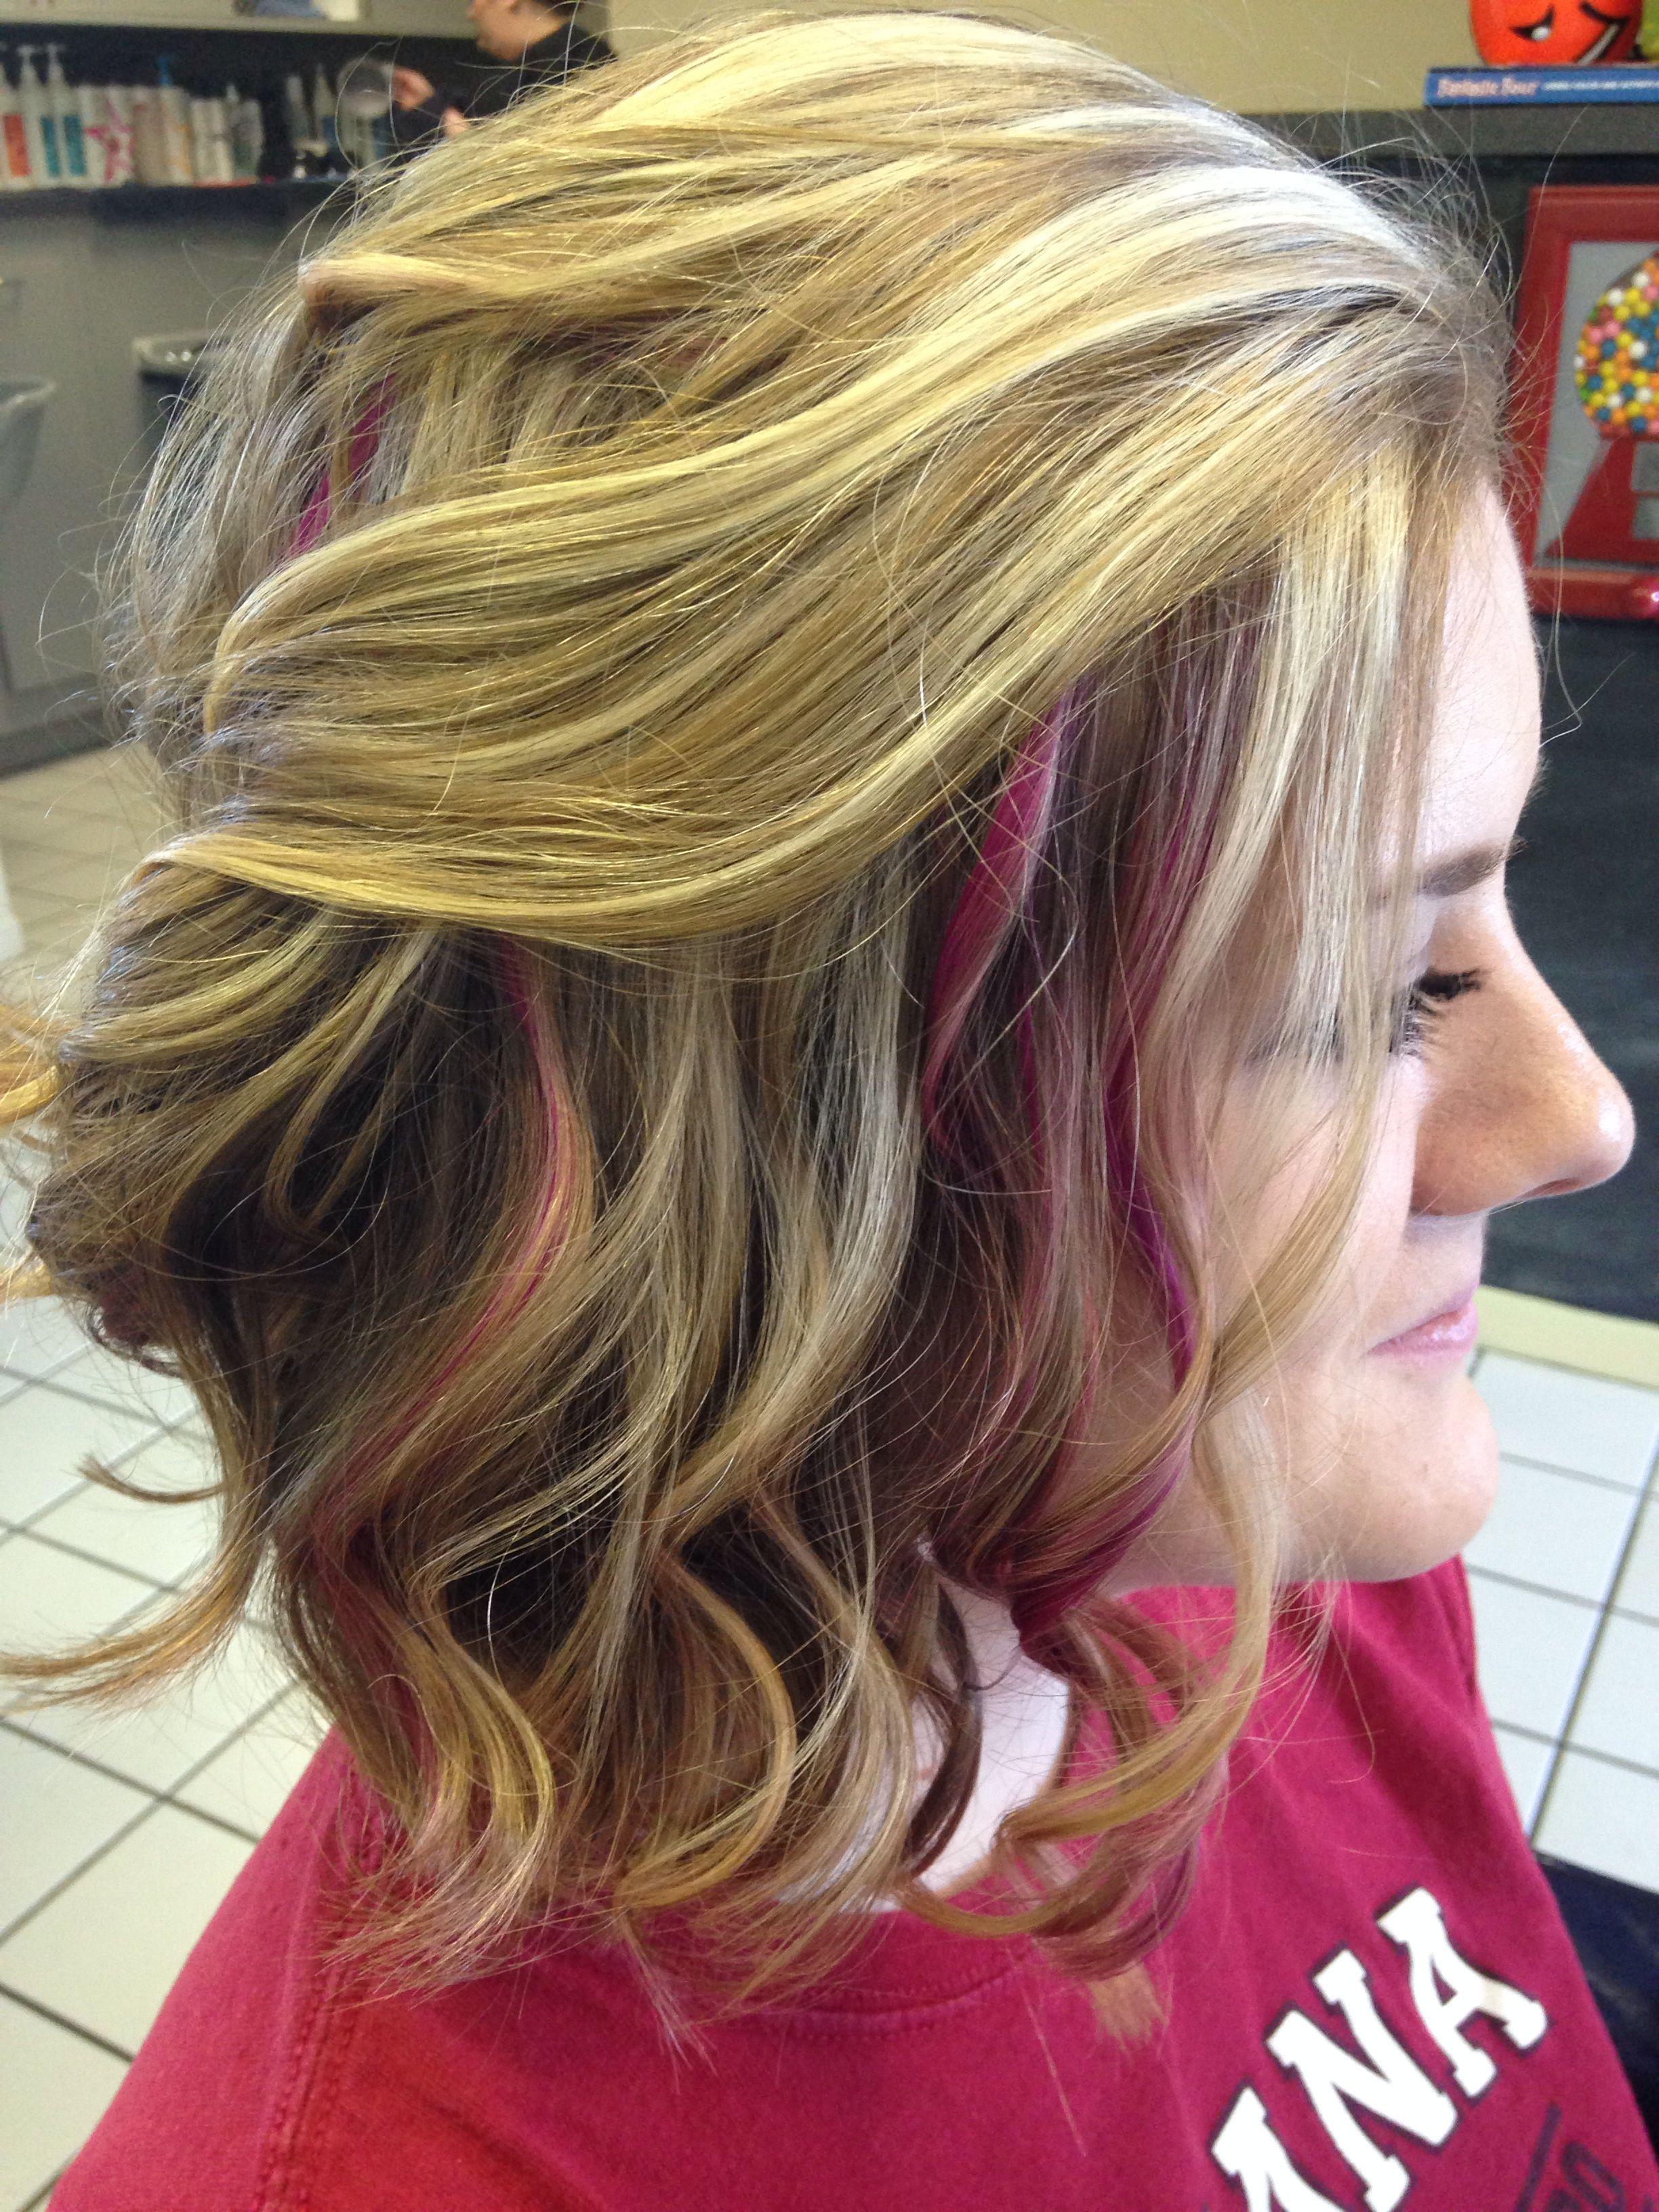 long bob with curls. pink peek